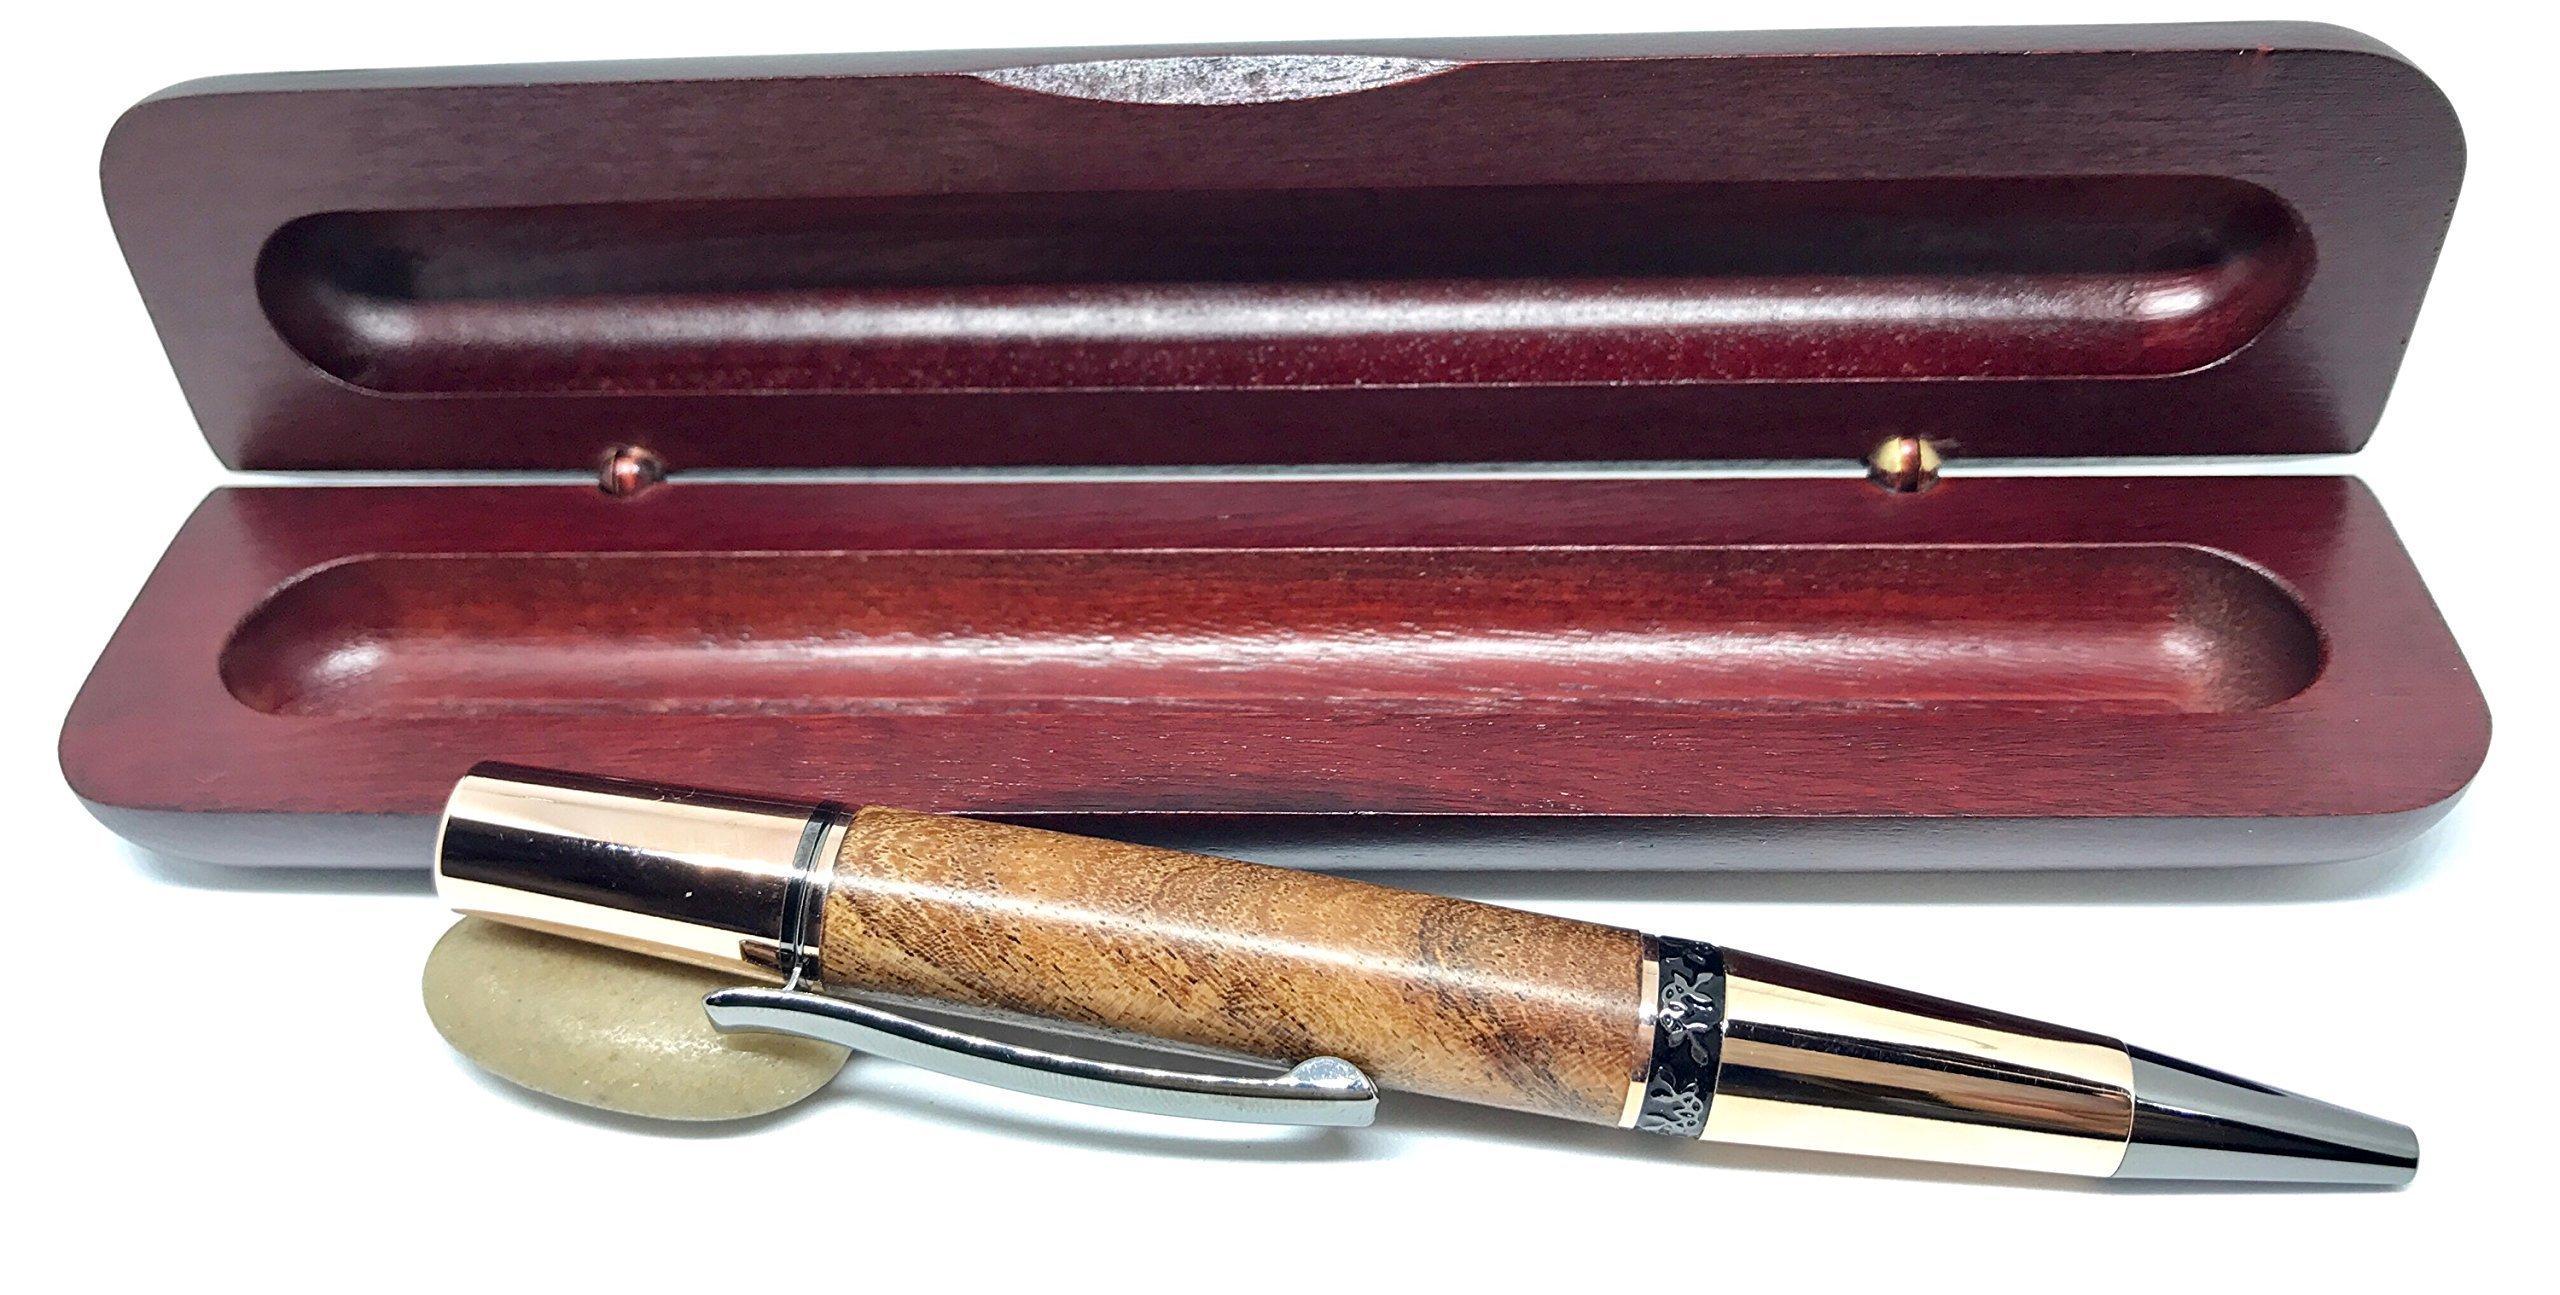 Rose Gold Texas Mesquite Ballpoint SoHo Pen - Bendecidos Pens - Handmade Wood Pen Great for Graduation, Birthday, Anniversary or Wedding Gifts